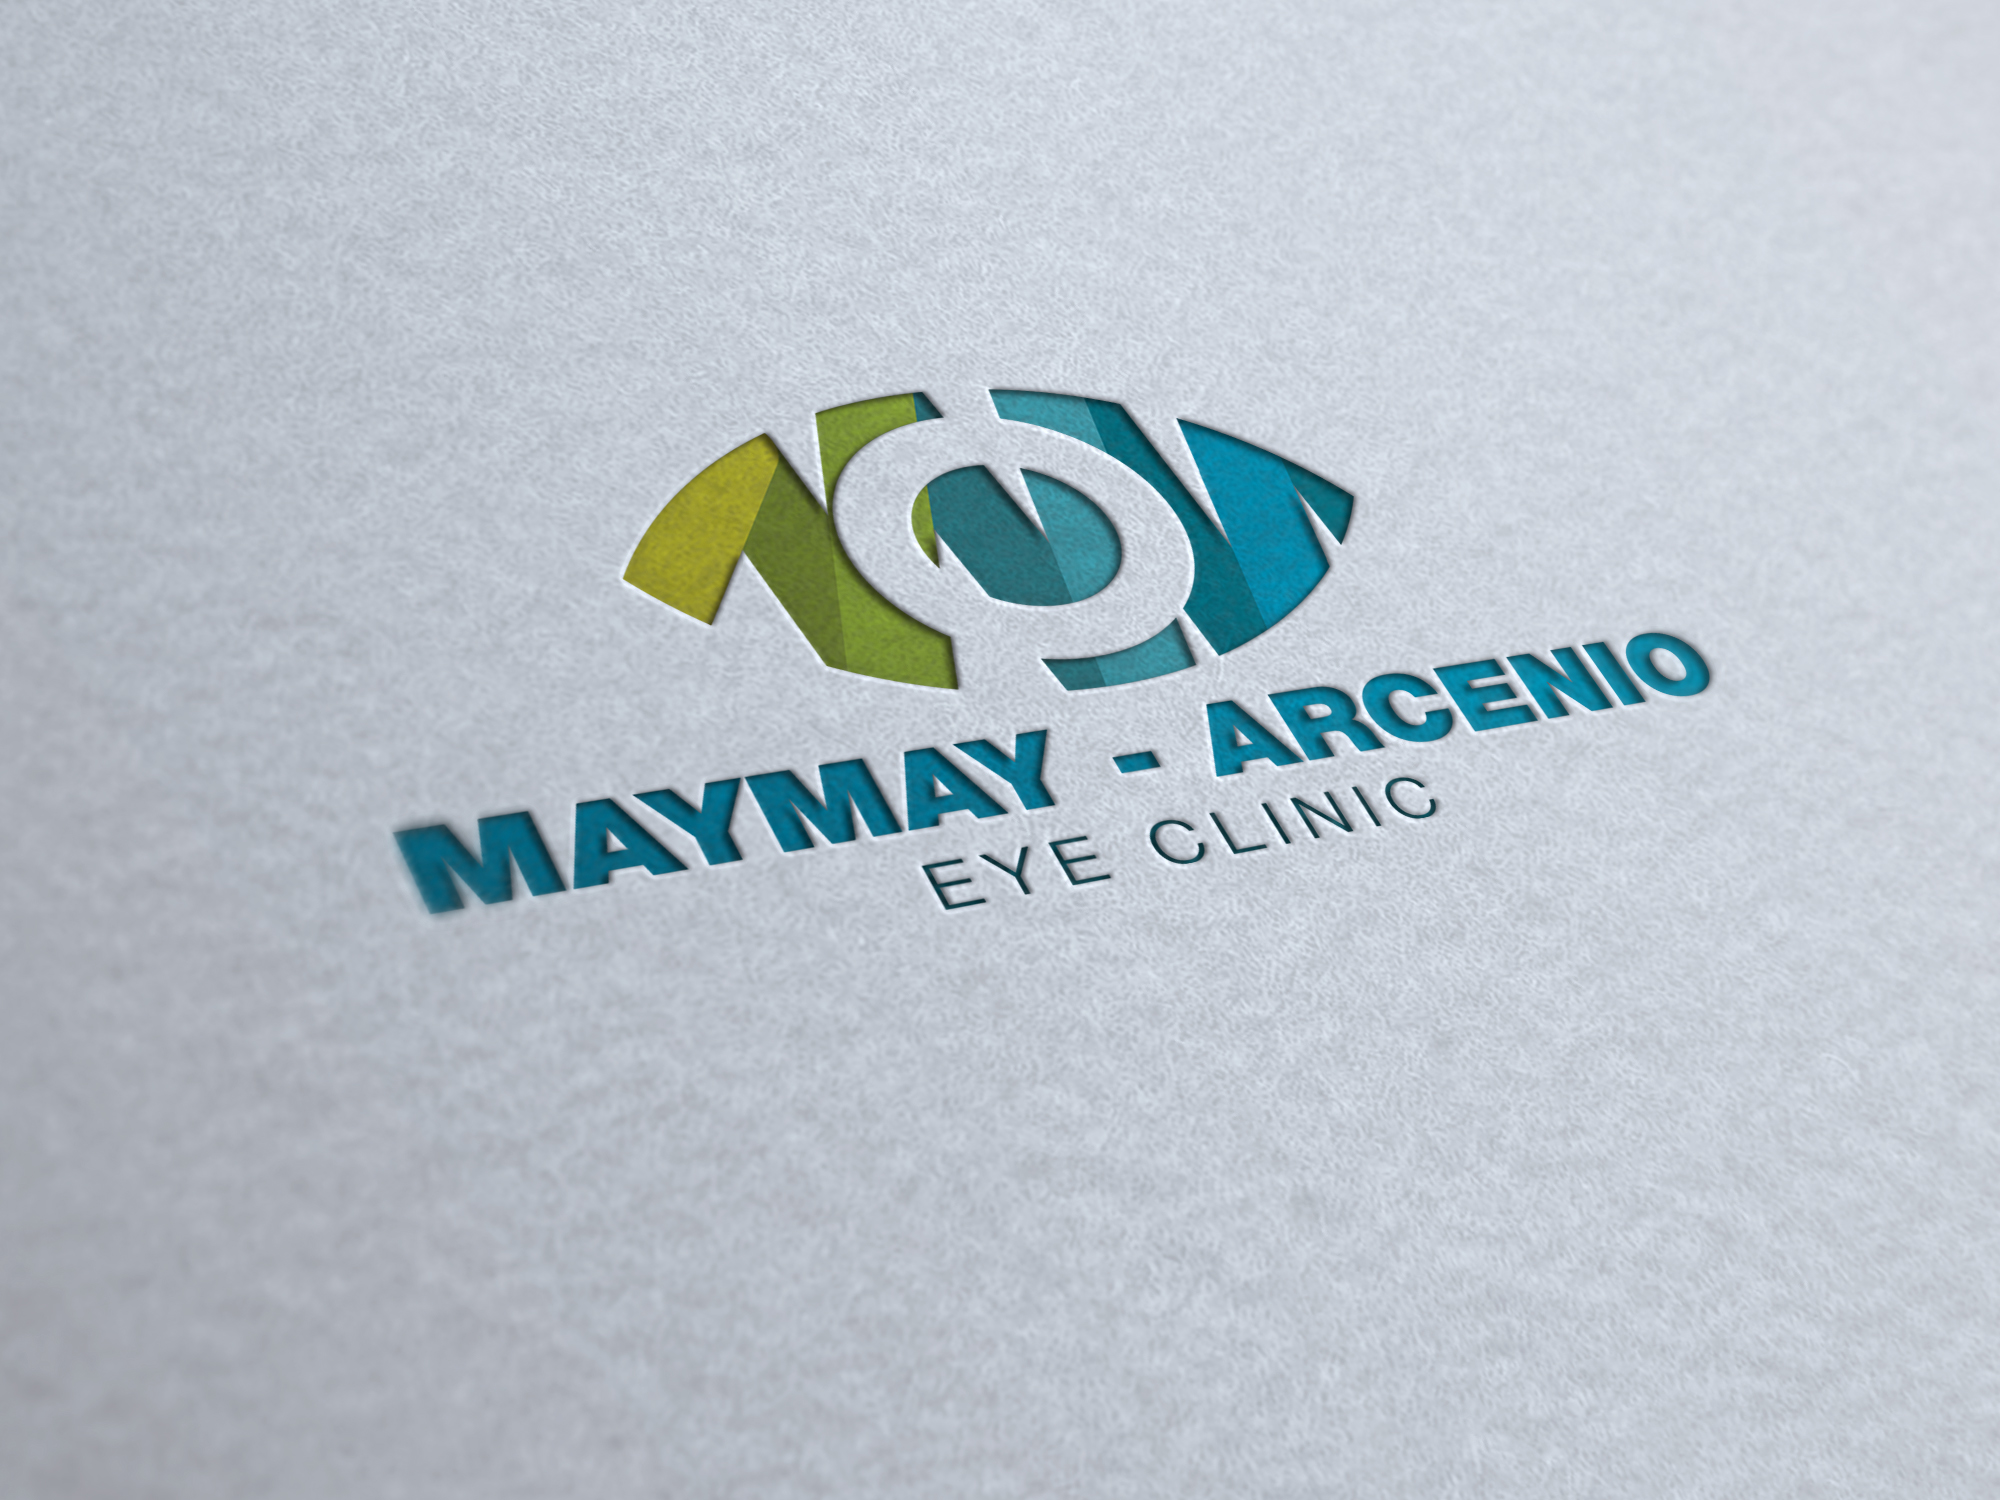 Maymay-Arcenio Eye Clinic